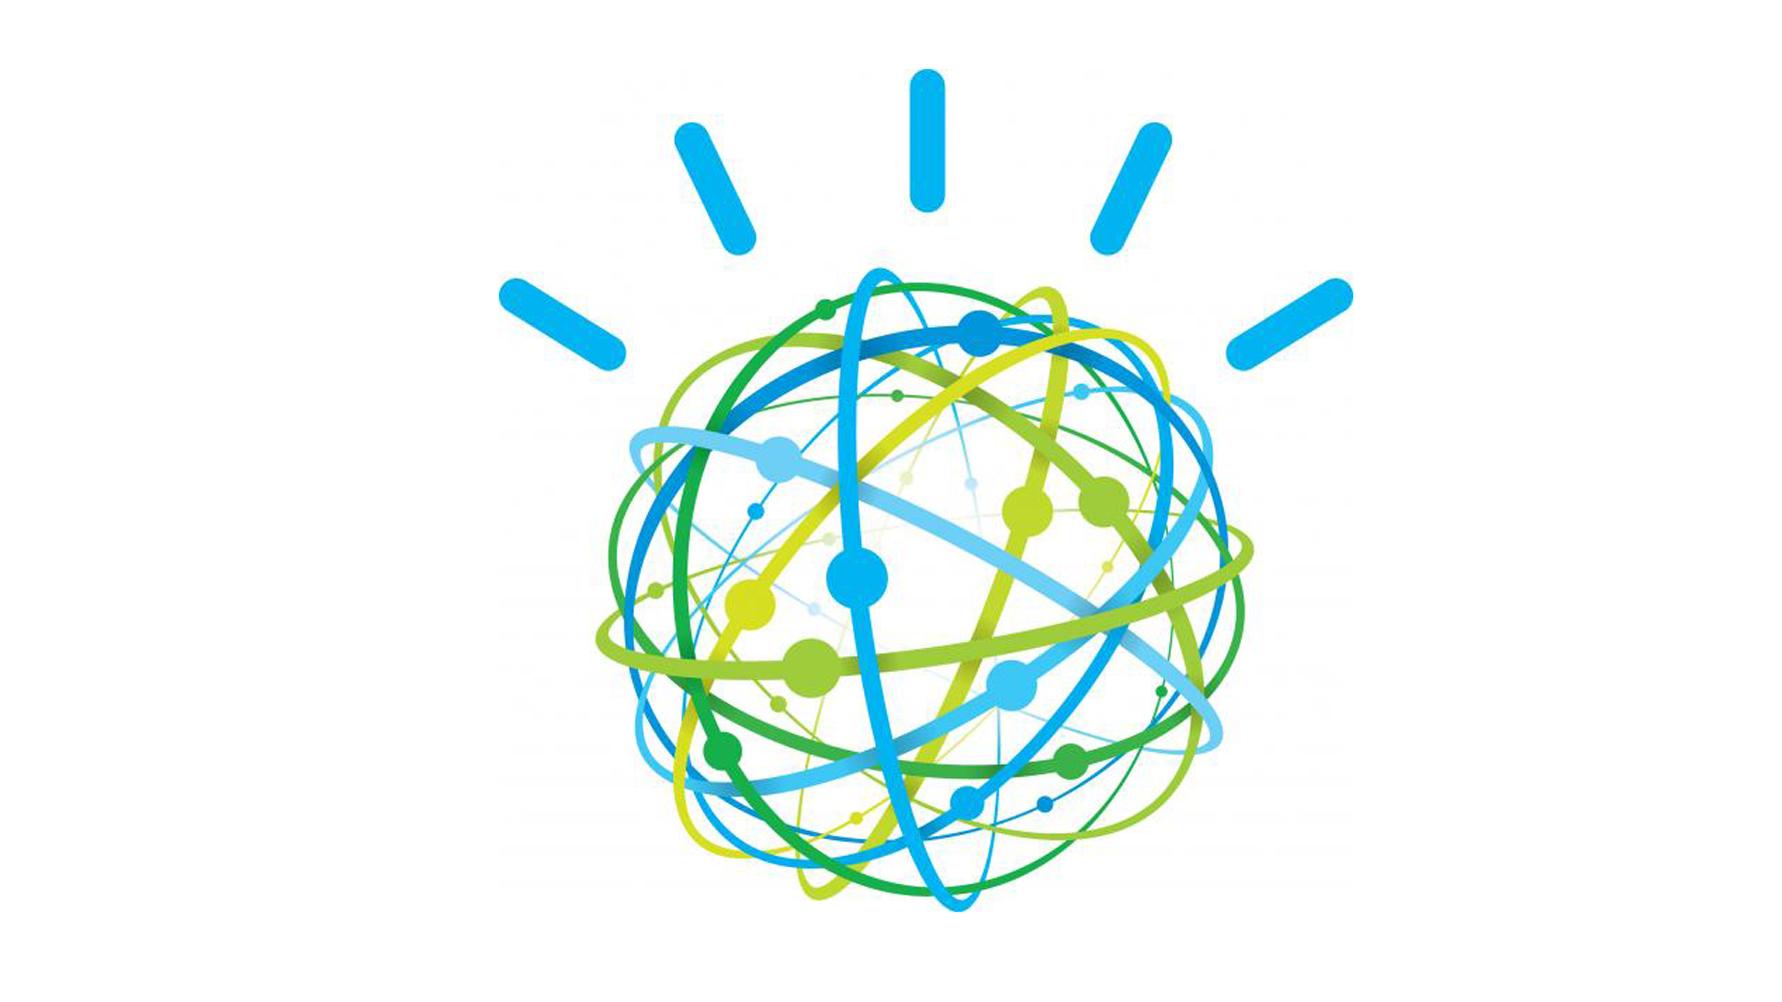 The IBM Watson logo